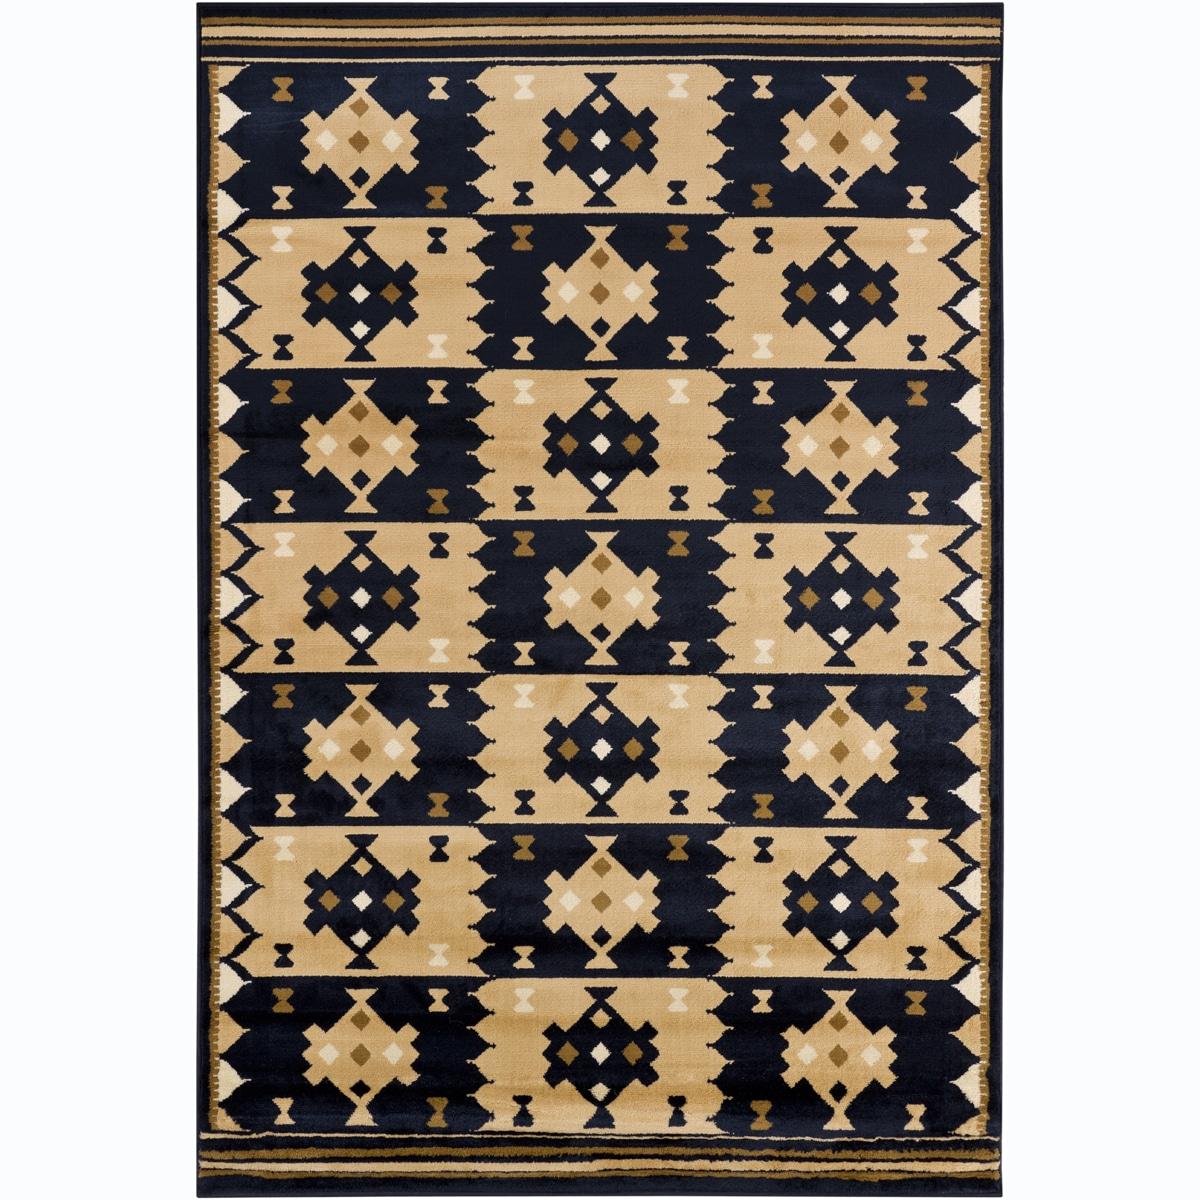 Artist's Loom Indoor Contemporary Geometric Rug - 5'3 x 7'9